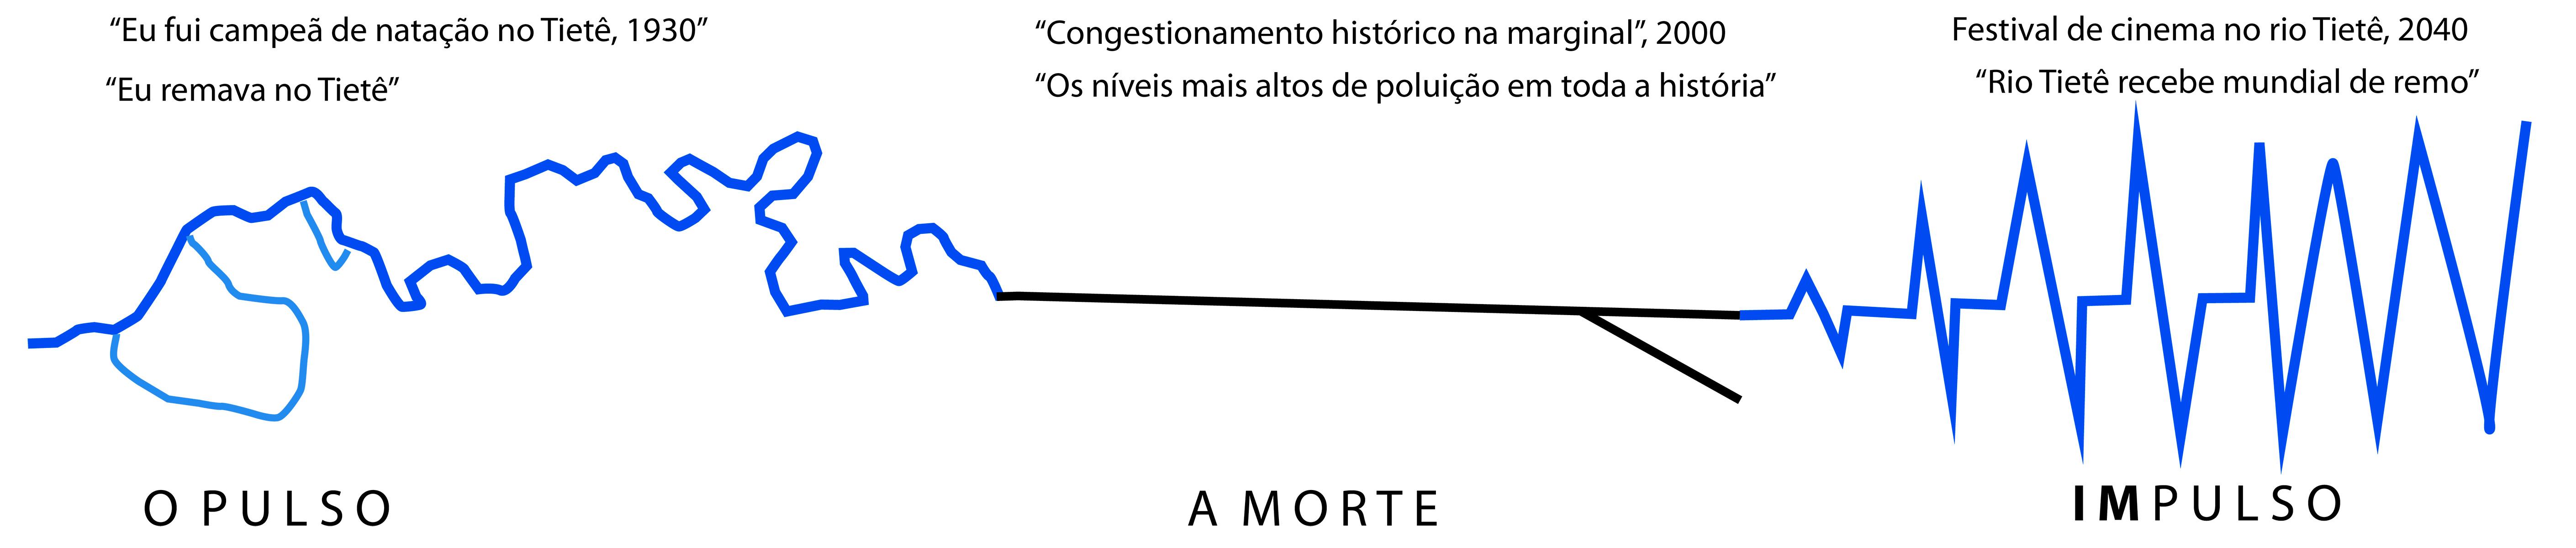 Impulso_elogio-ao-rio-tiete